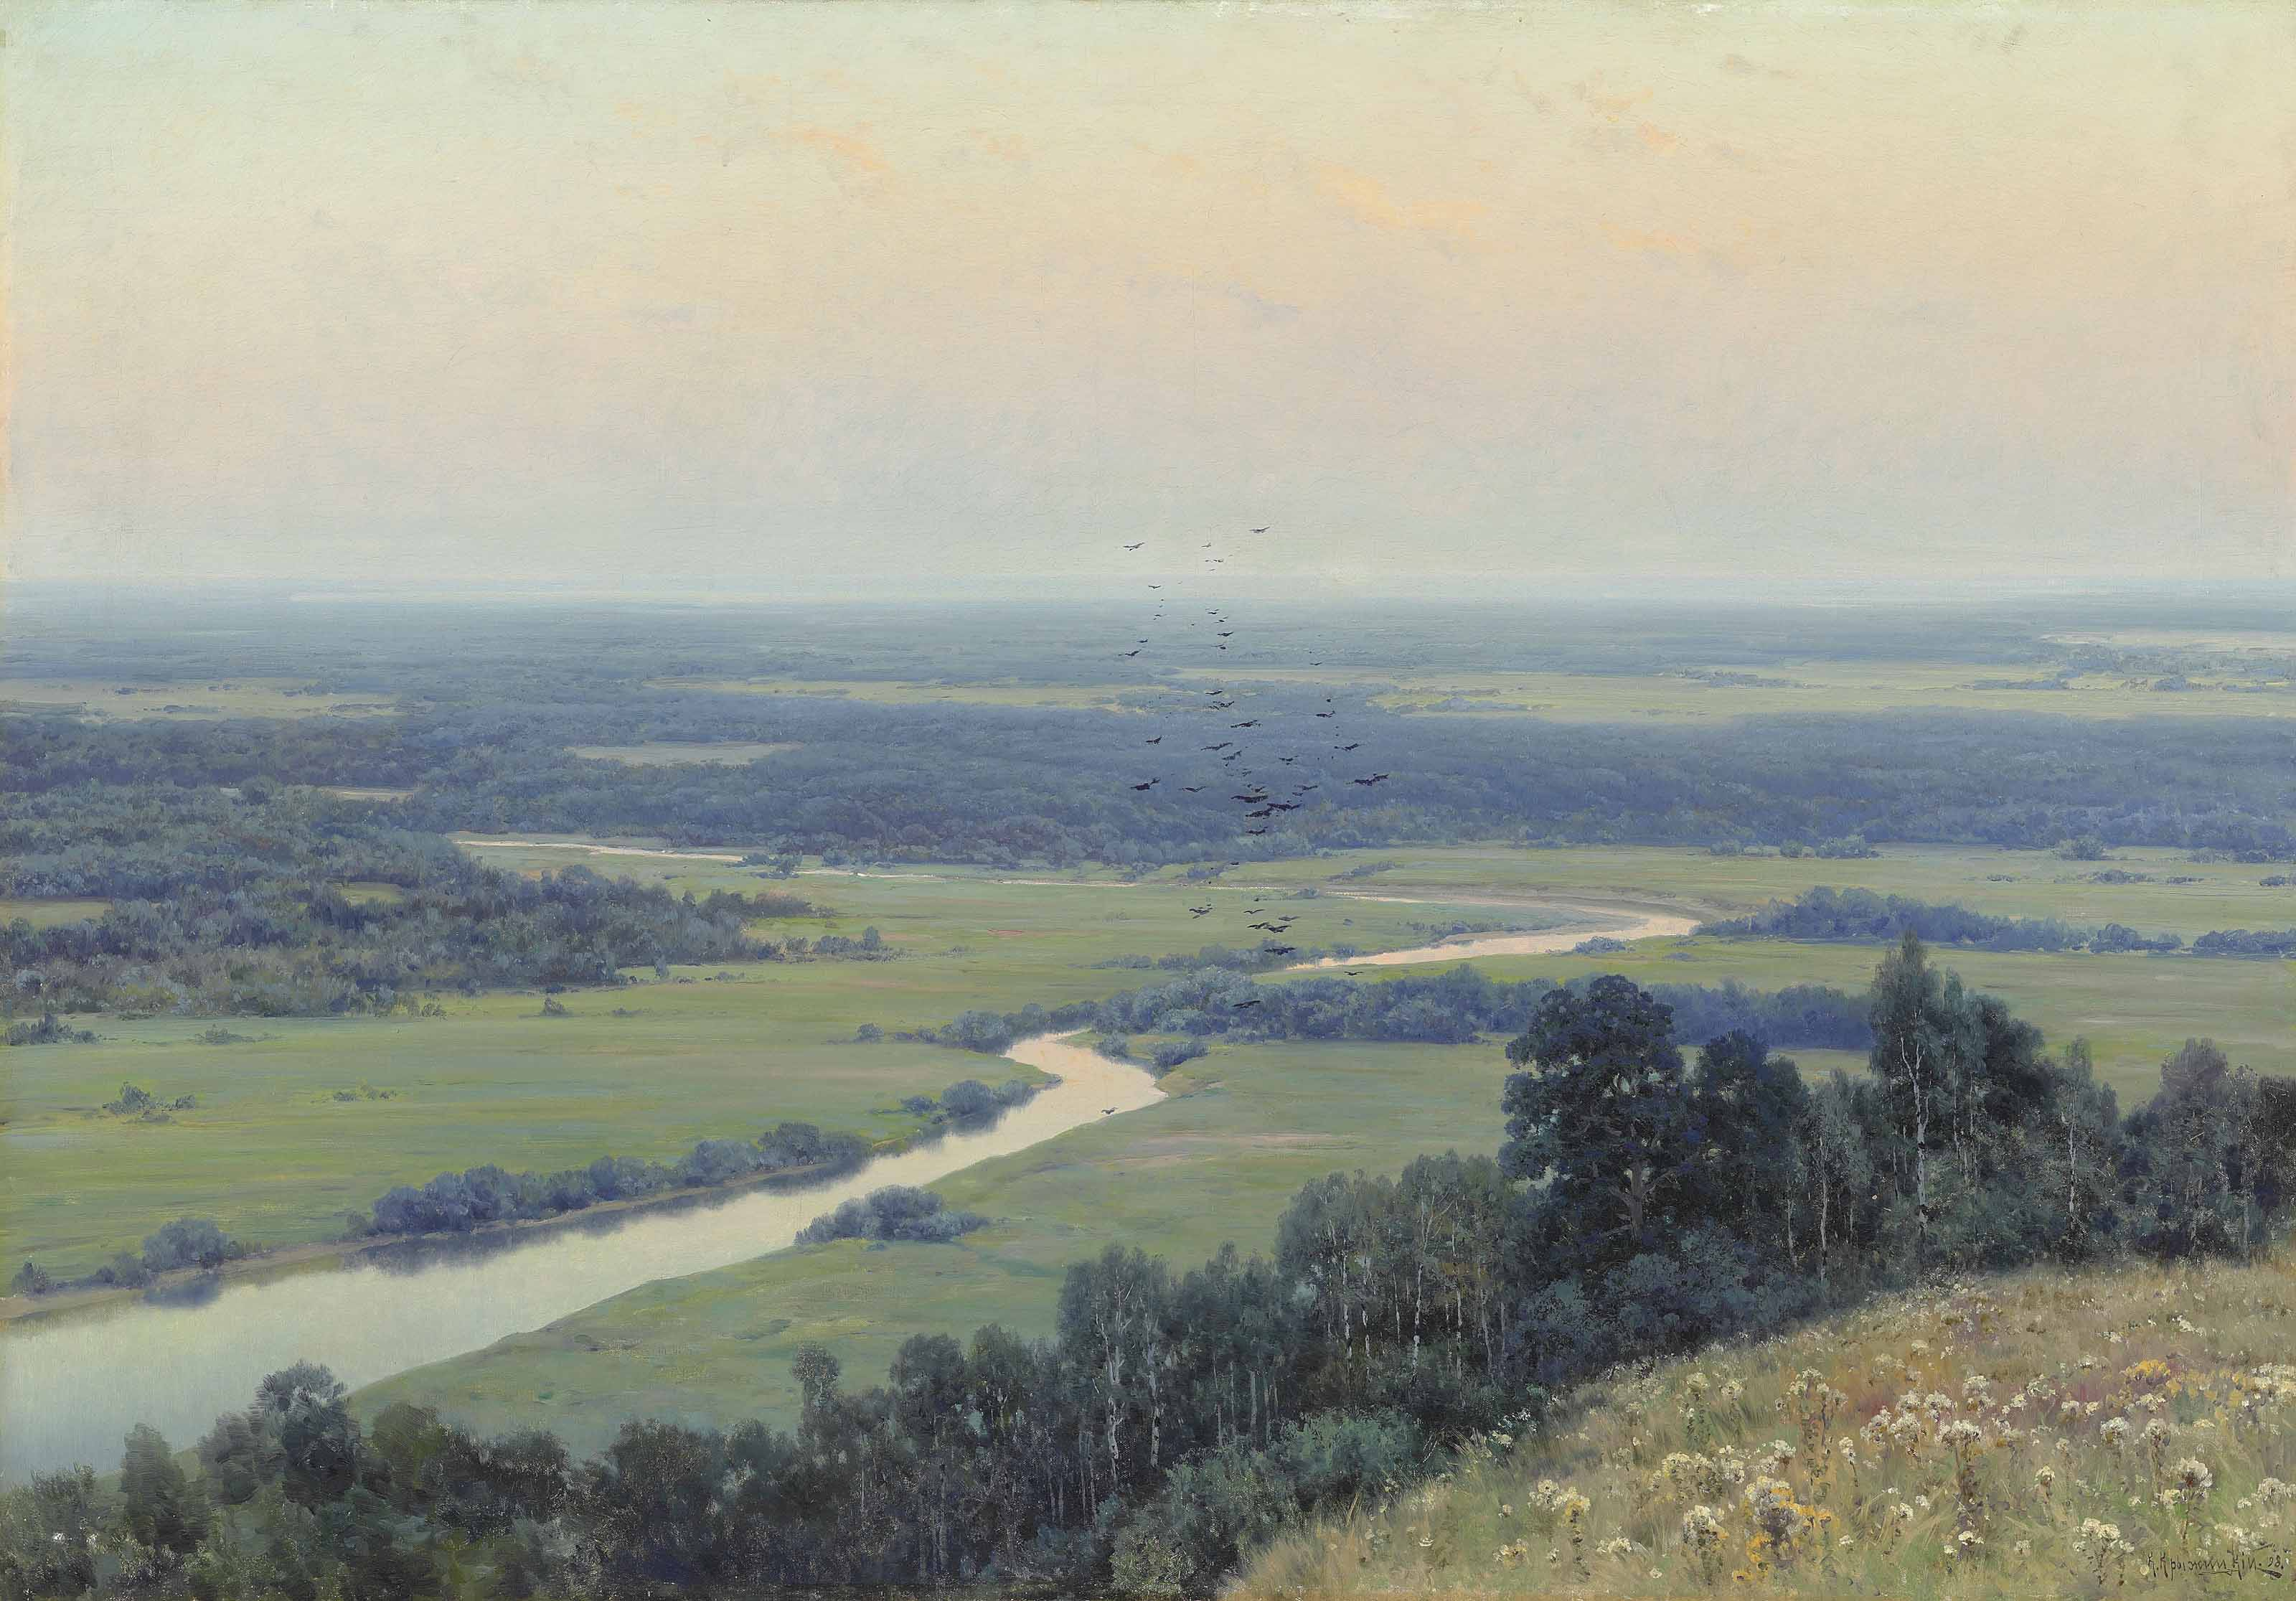 Tver province